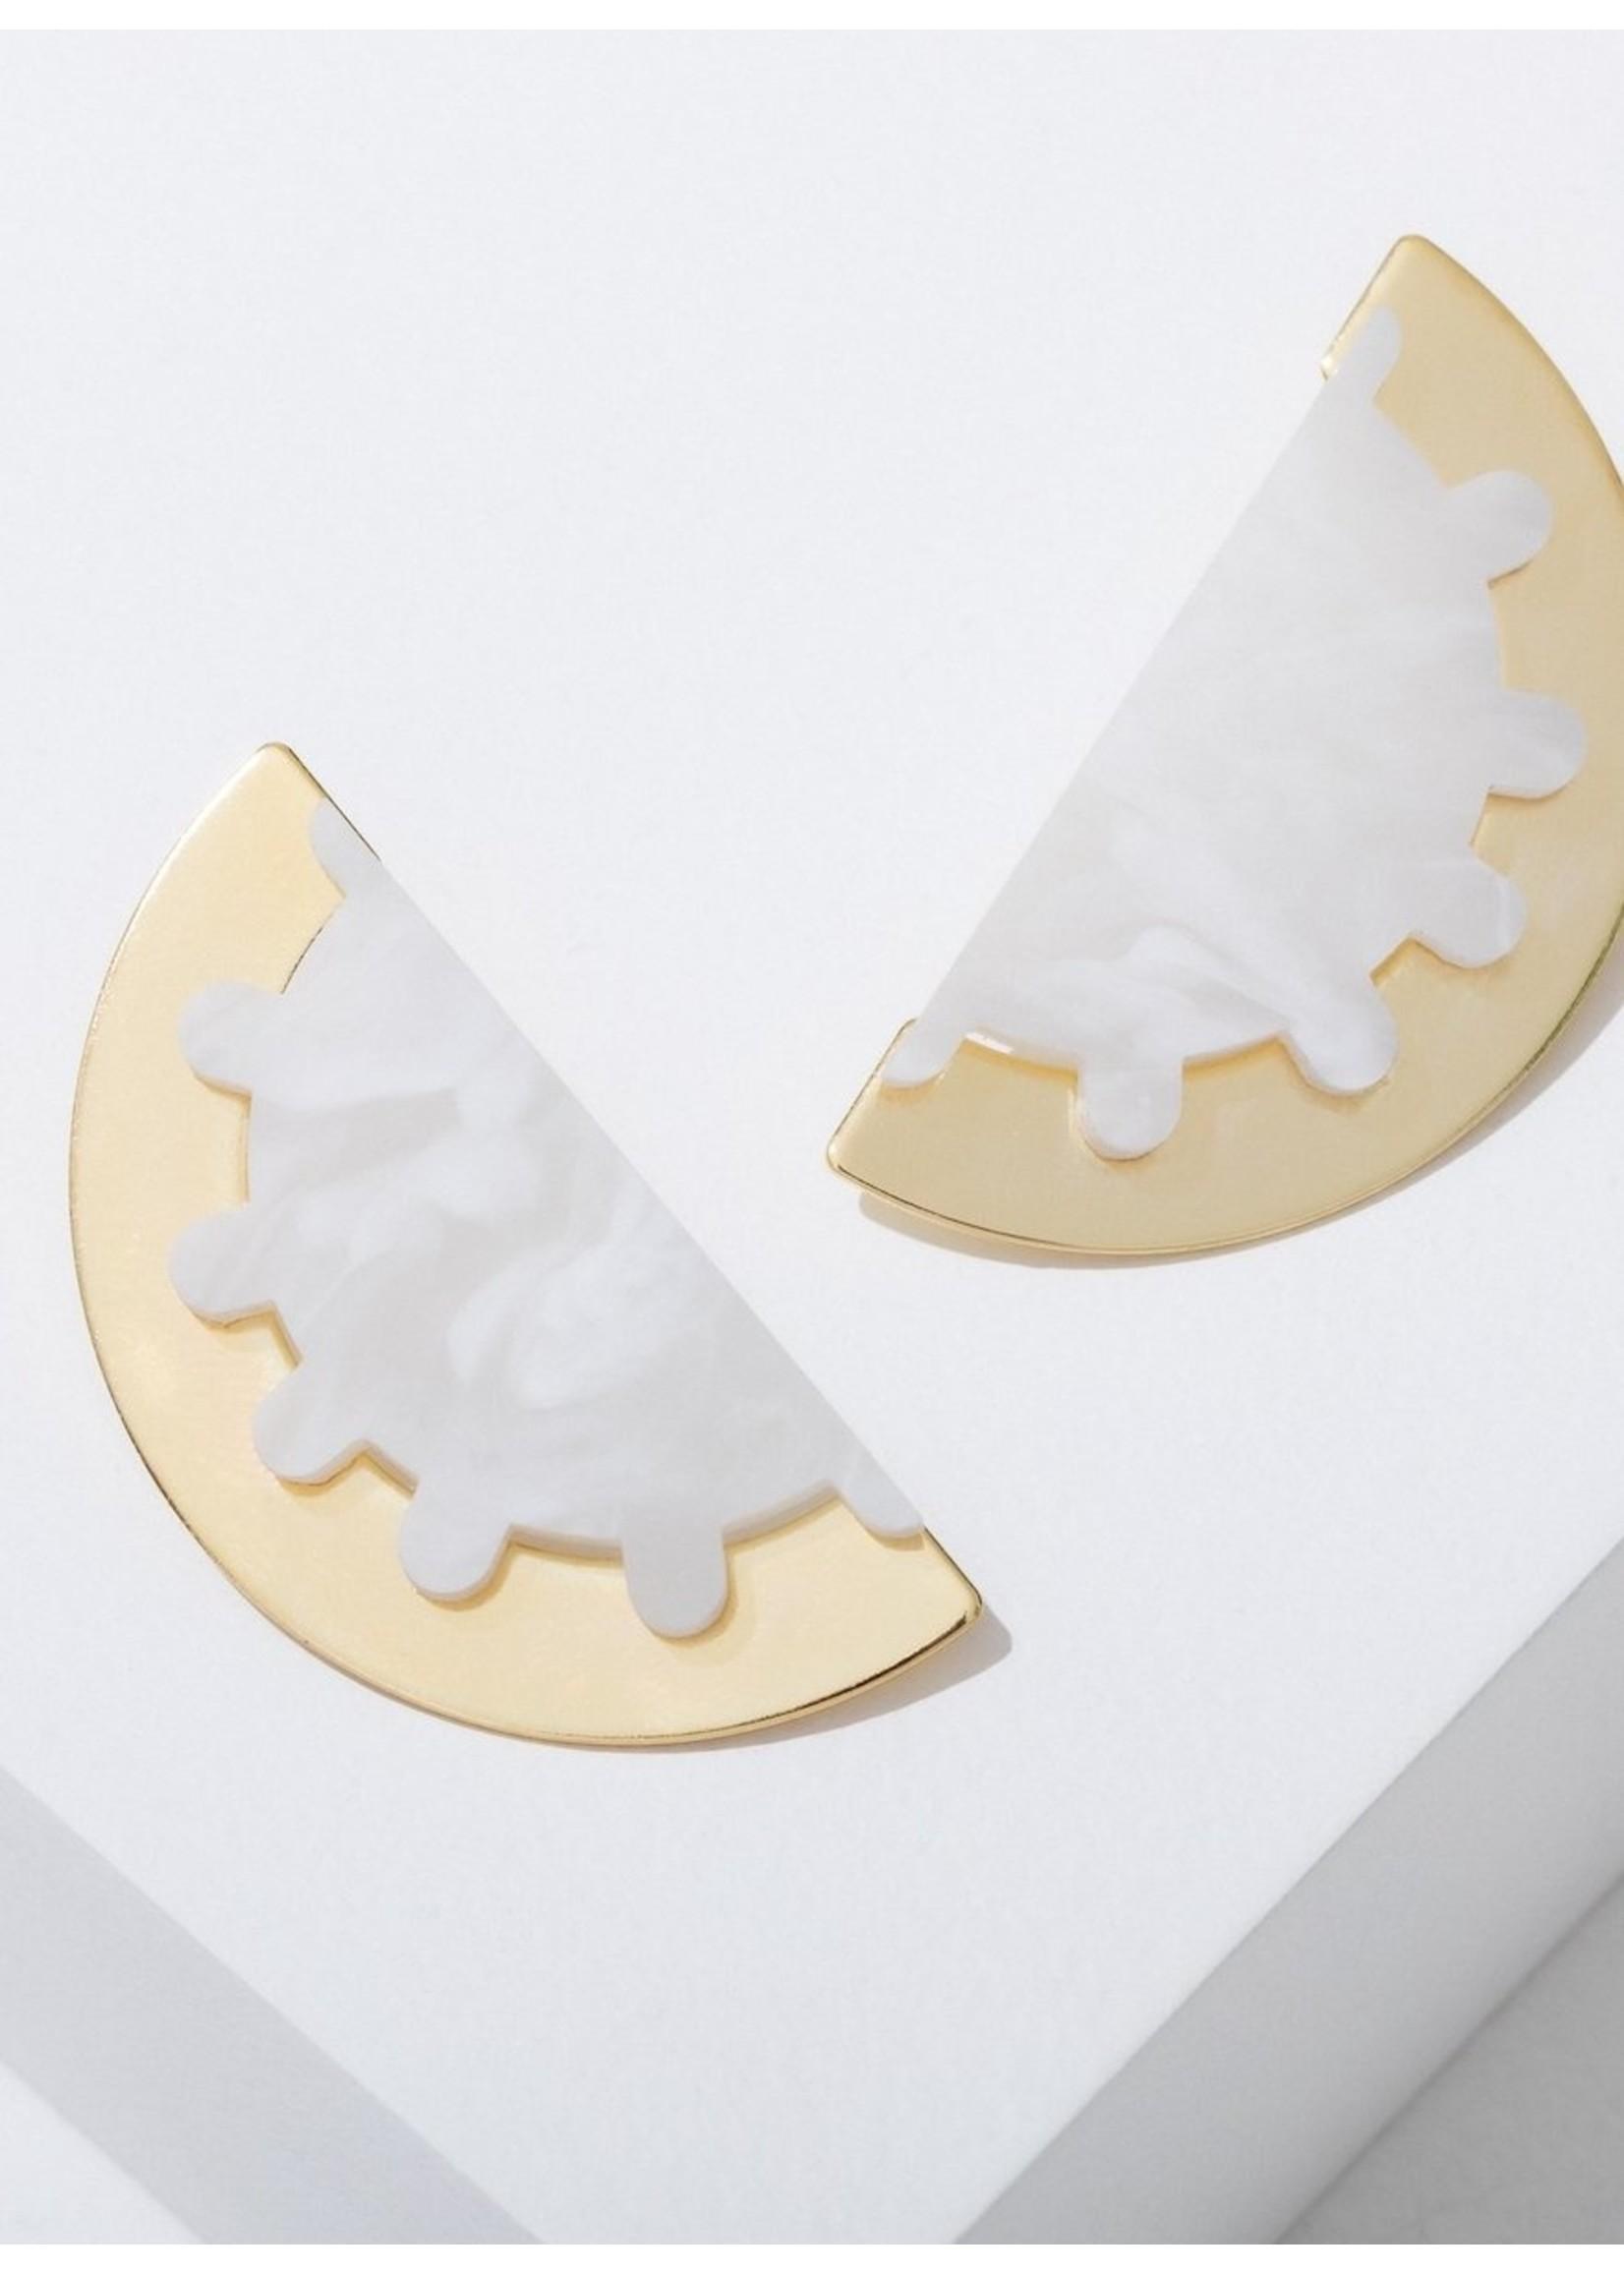 Larissa Loden Larissa Loden Styles Earrings (Gold/Alabaster)